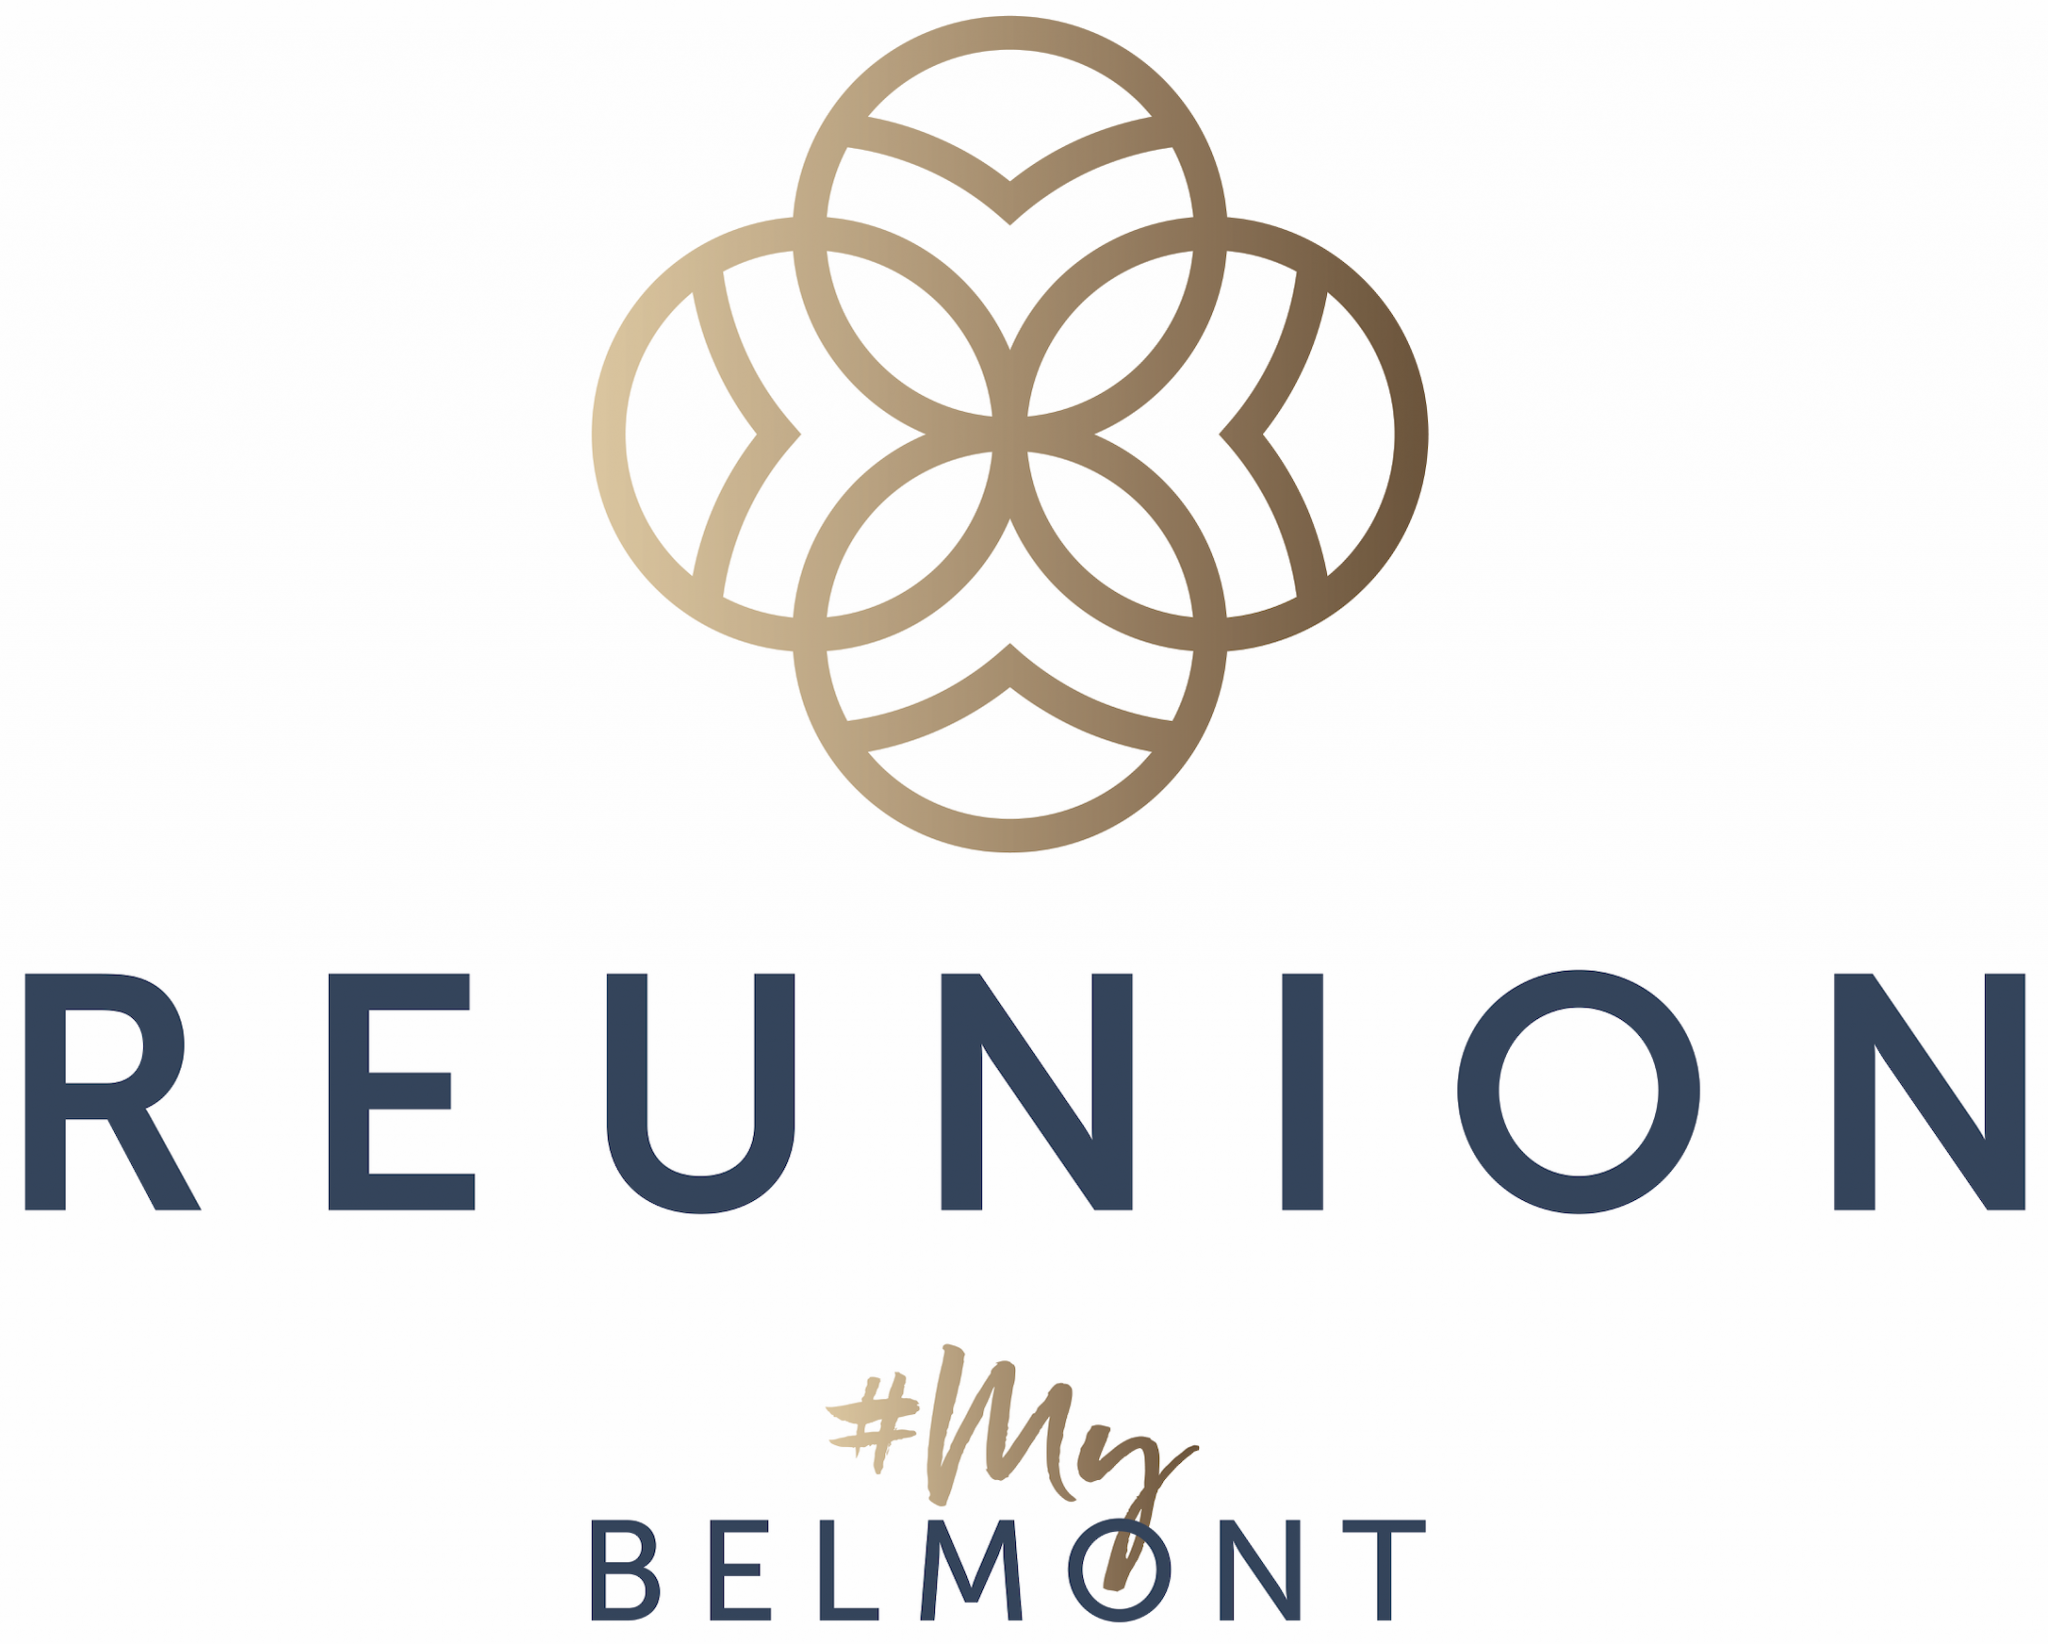 Belmont Reunion